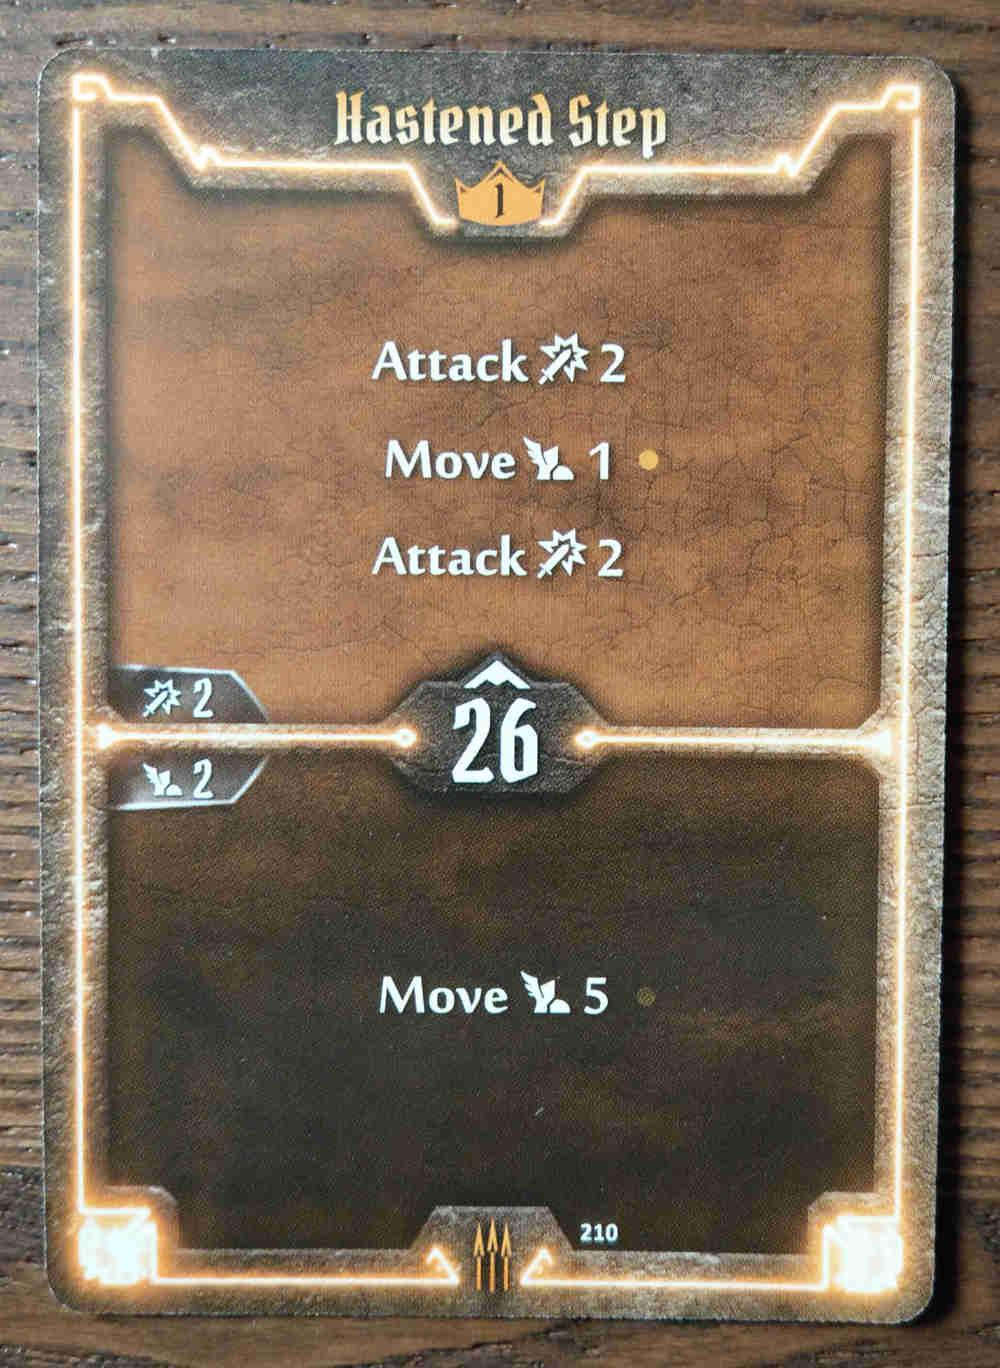 Level 1 Quartermaster card Hastened Step